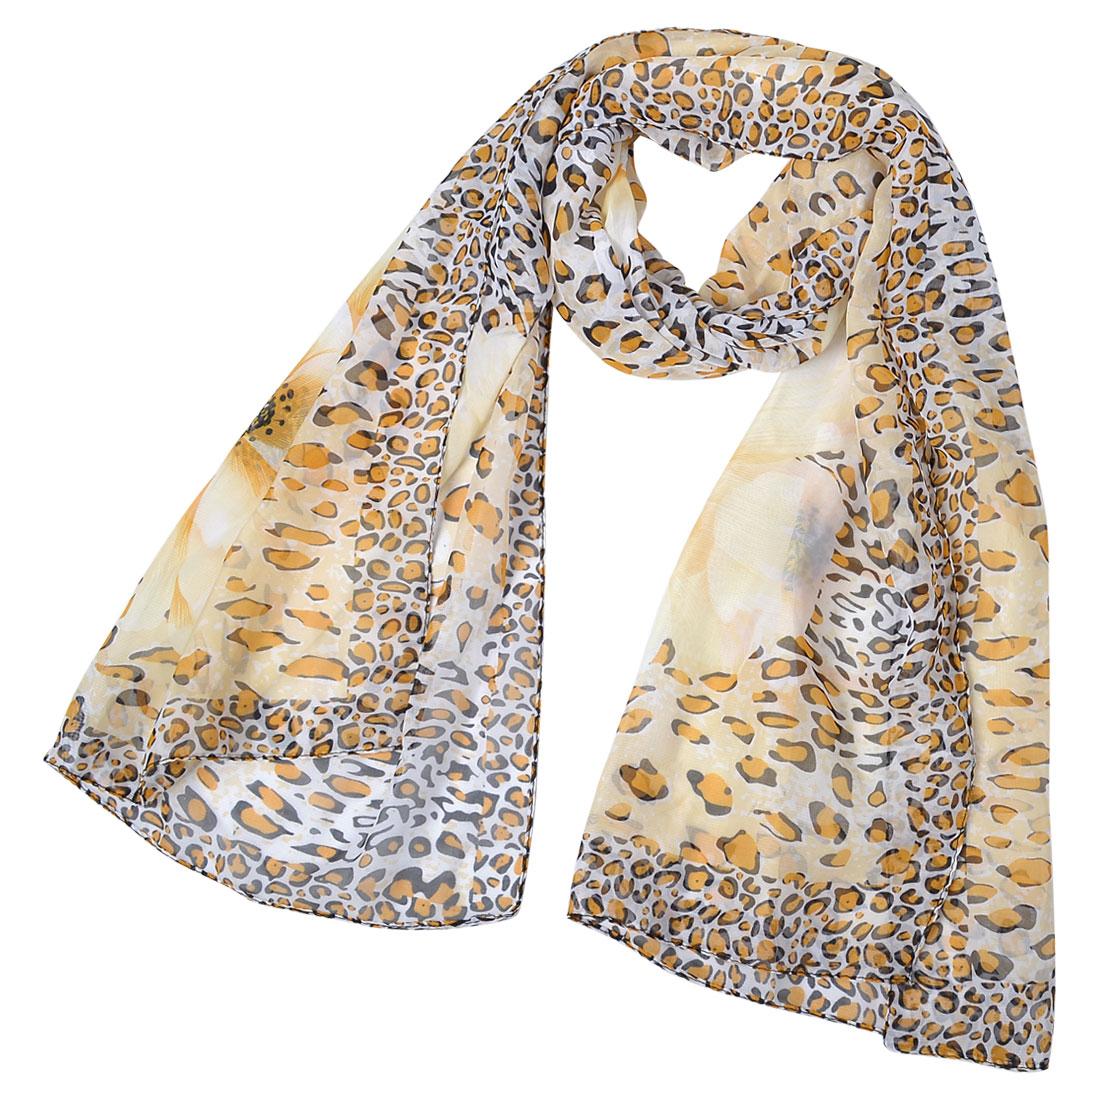 "Women Black Orange Leopard Pattern Floral Chiffon Scarf Shawl 62.2"""